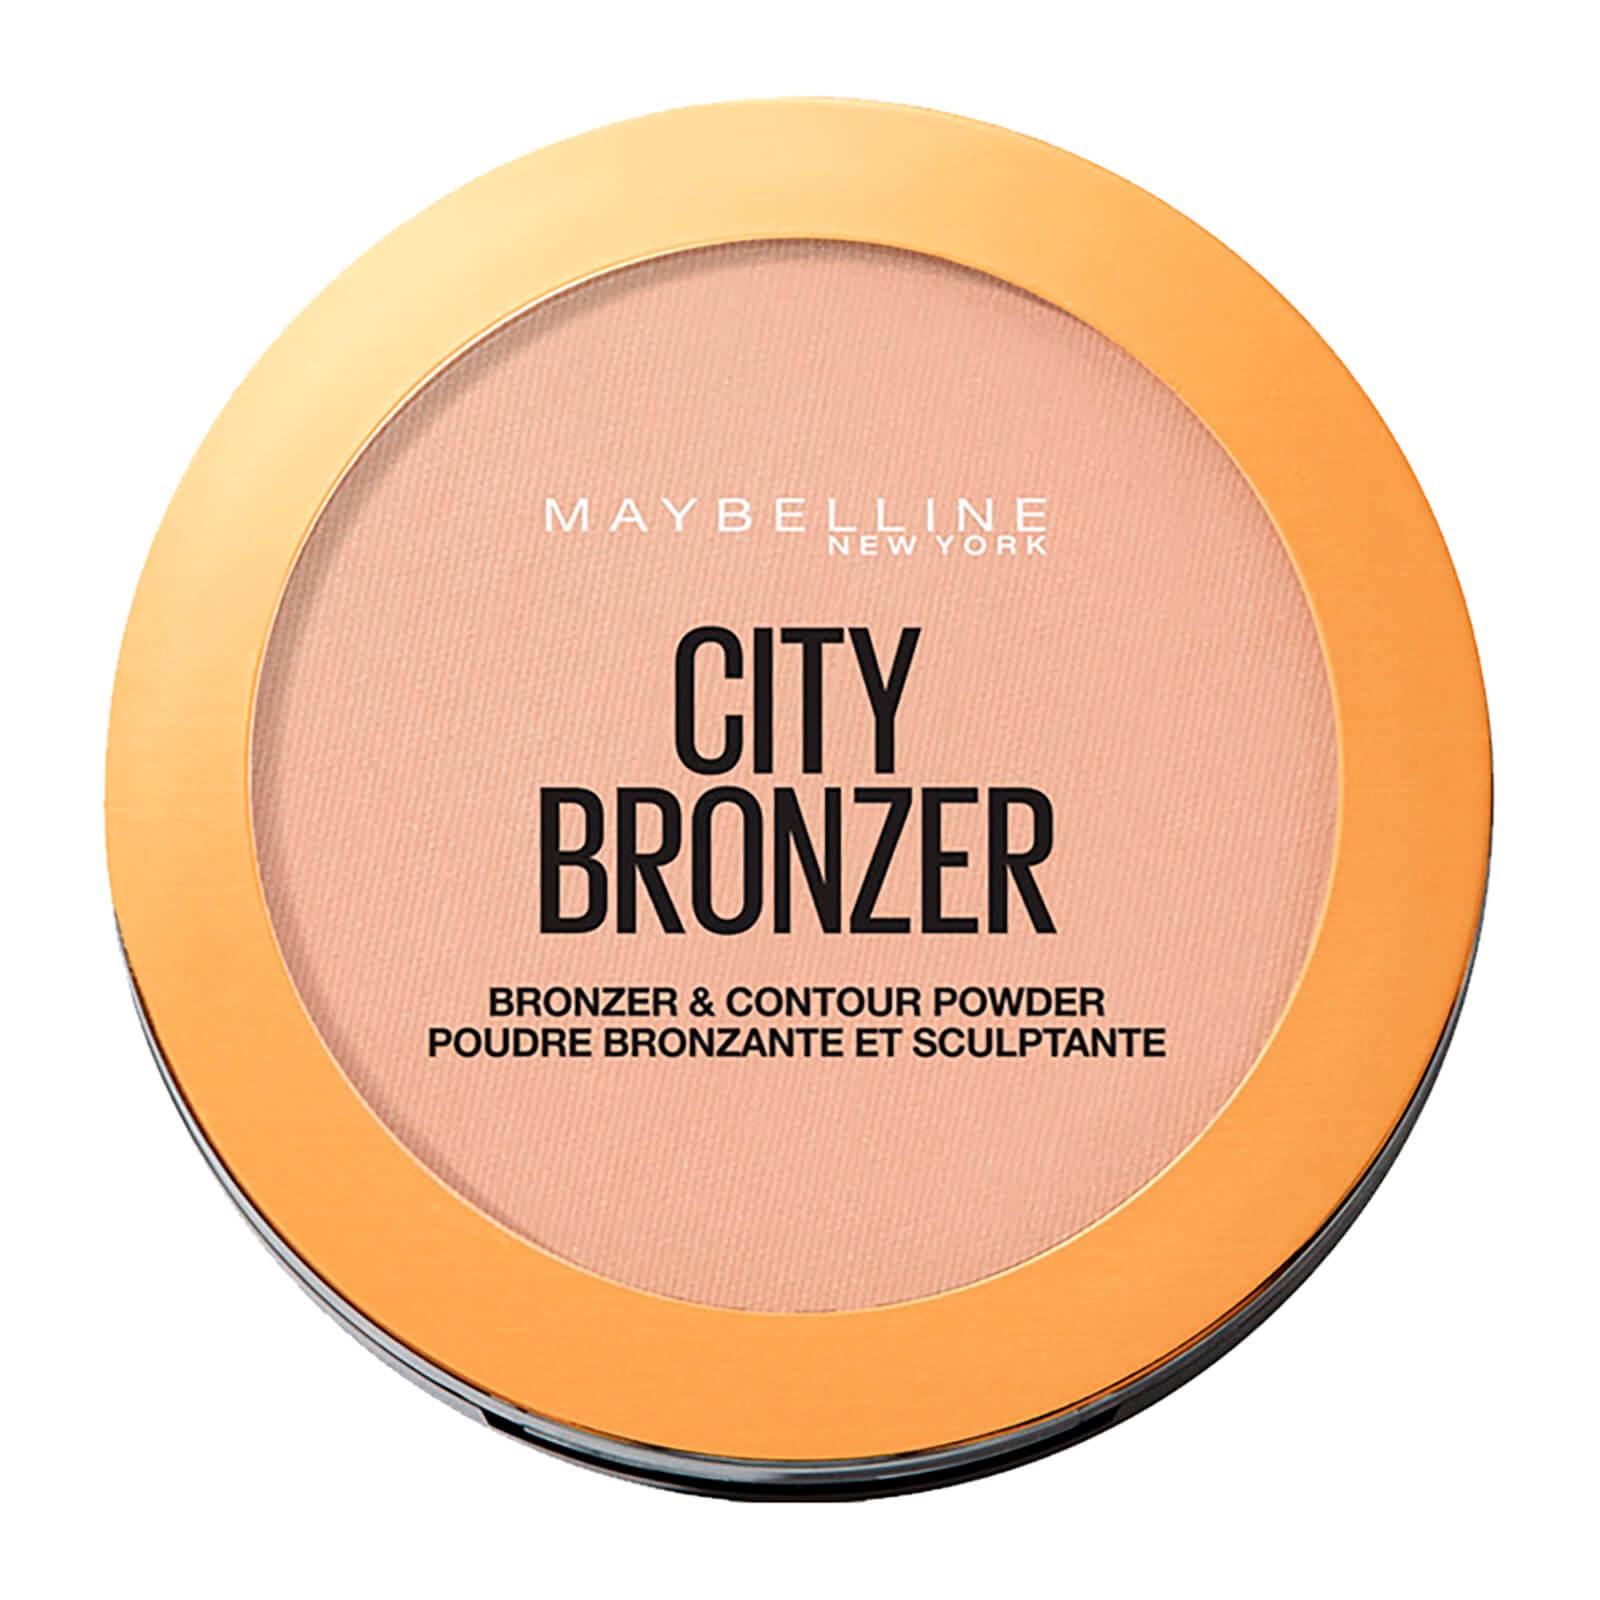 Купить Maybelline City Bronzer and Contour Powder 8g (Various Shades) - 250 Medium Warm